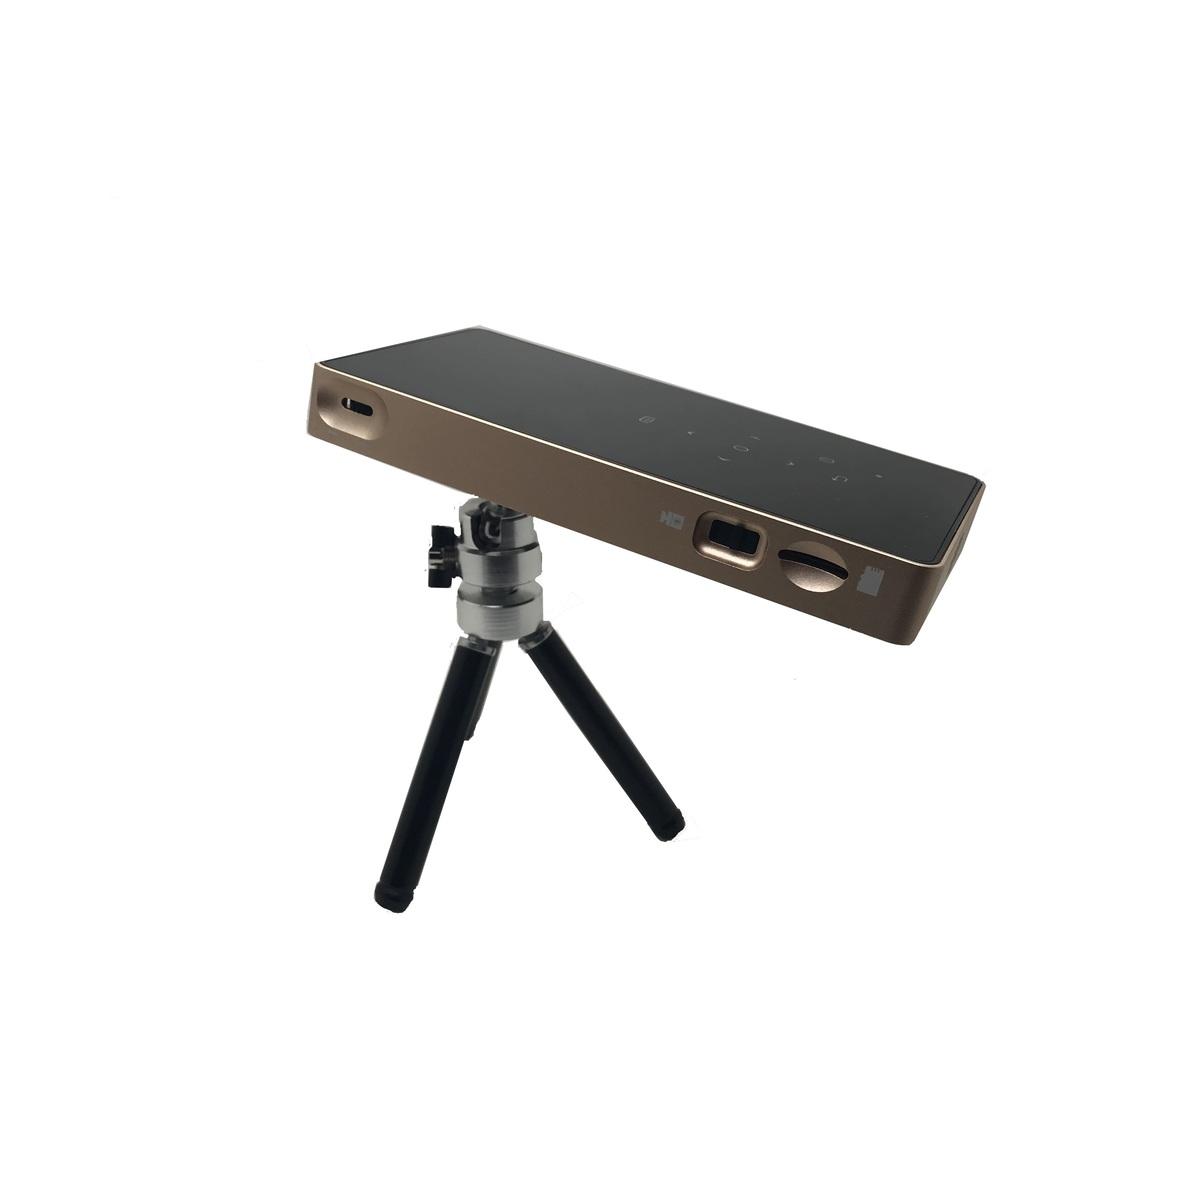 M2 Pro Mini Smart Projector